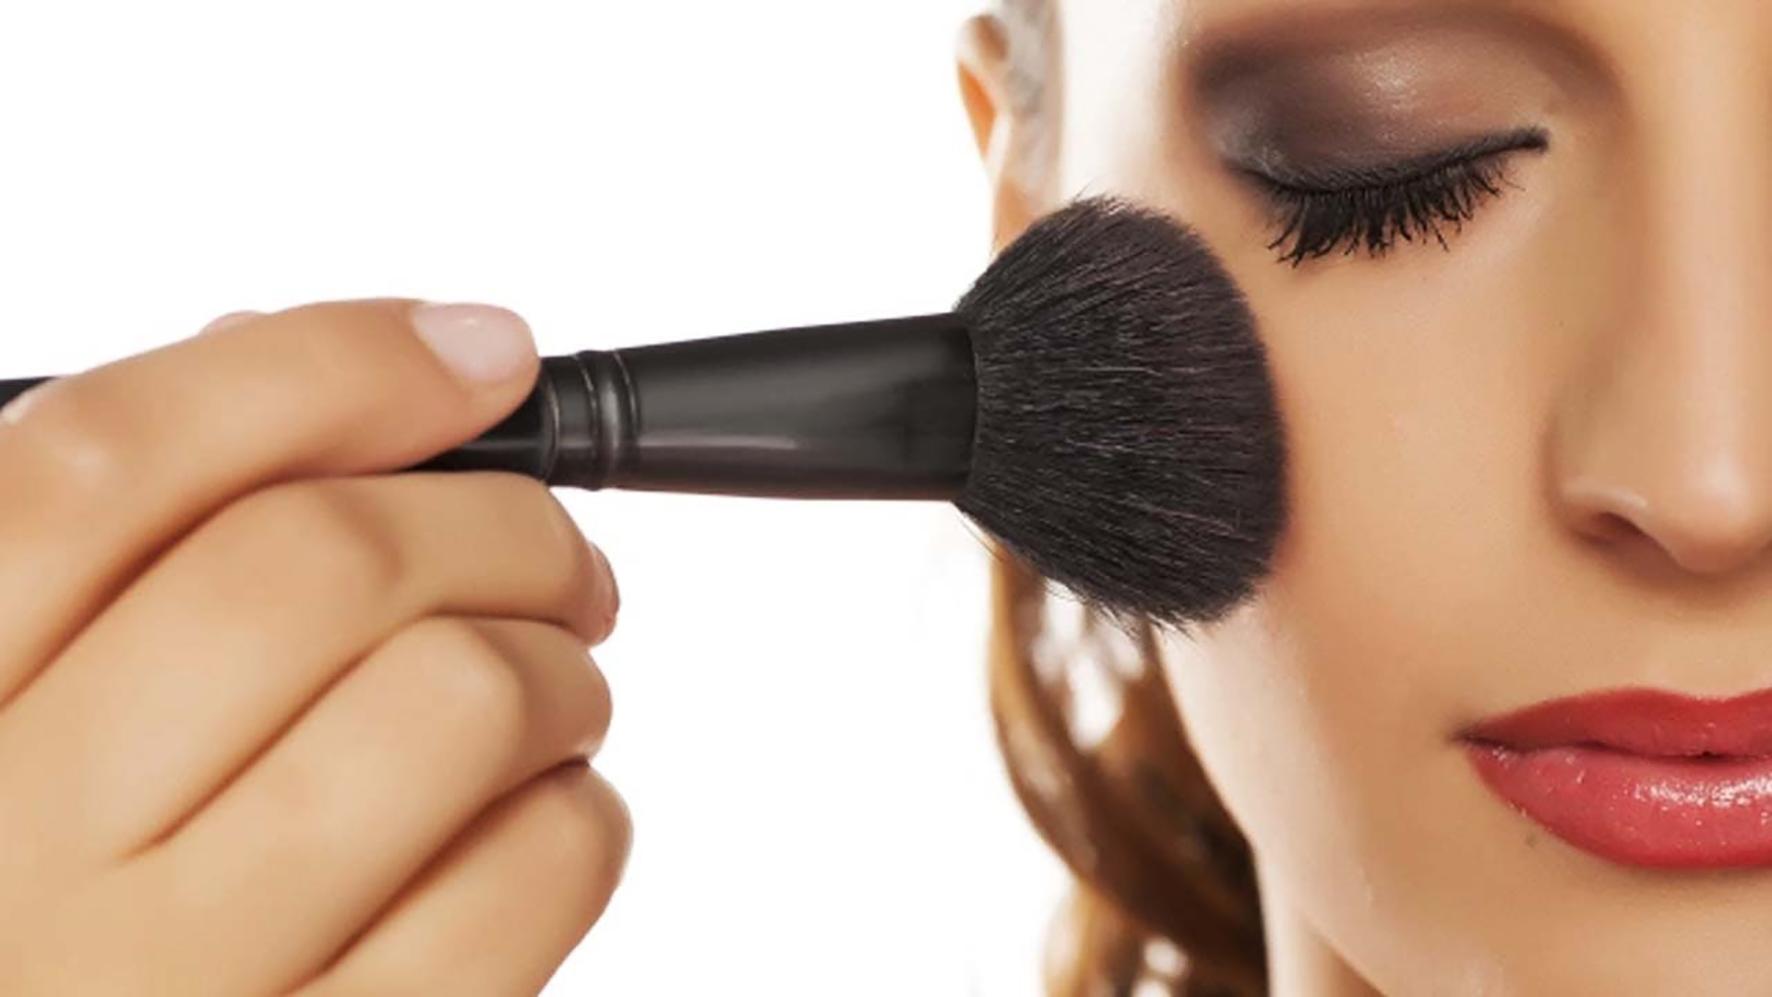 10 Tips To Make Your Make-up Last Longer